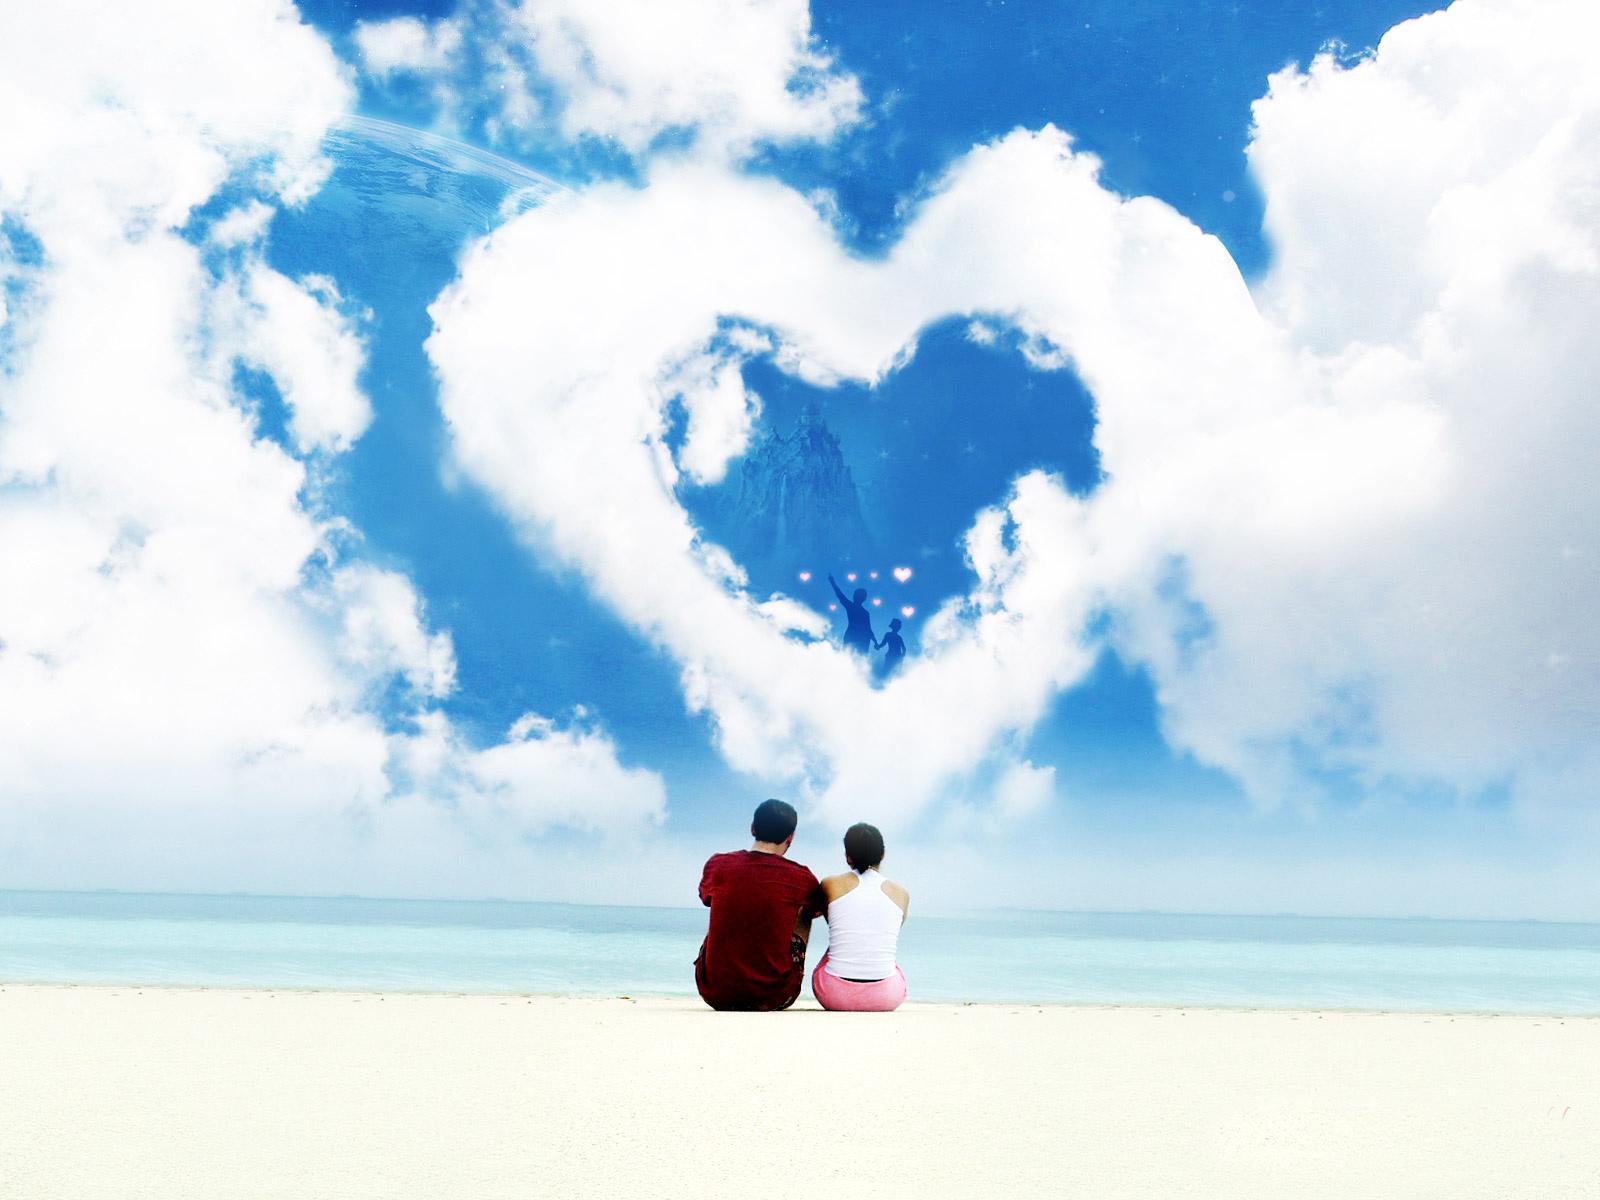 http://4.bp.blogspot.com/_TUn_aUL9k14/SxErXfyfZPI/AAAAAAAADj4/67YcKrz0FjI/s1600/imagini_indragostiti_desktop3.jpg